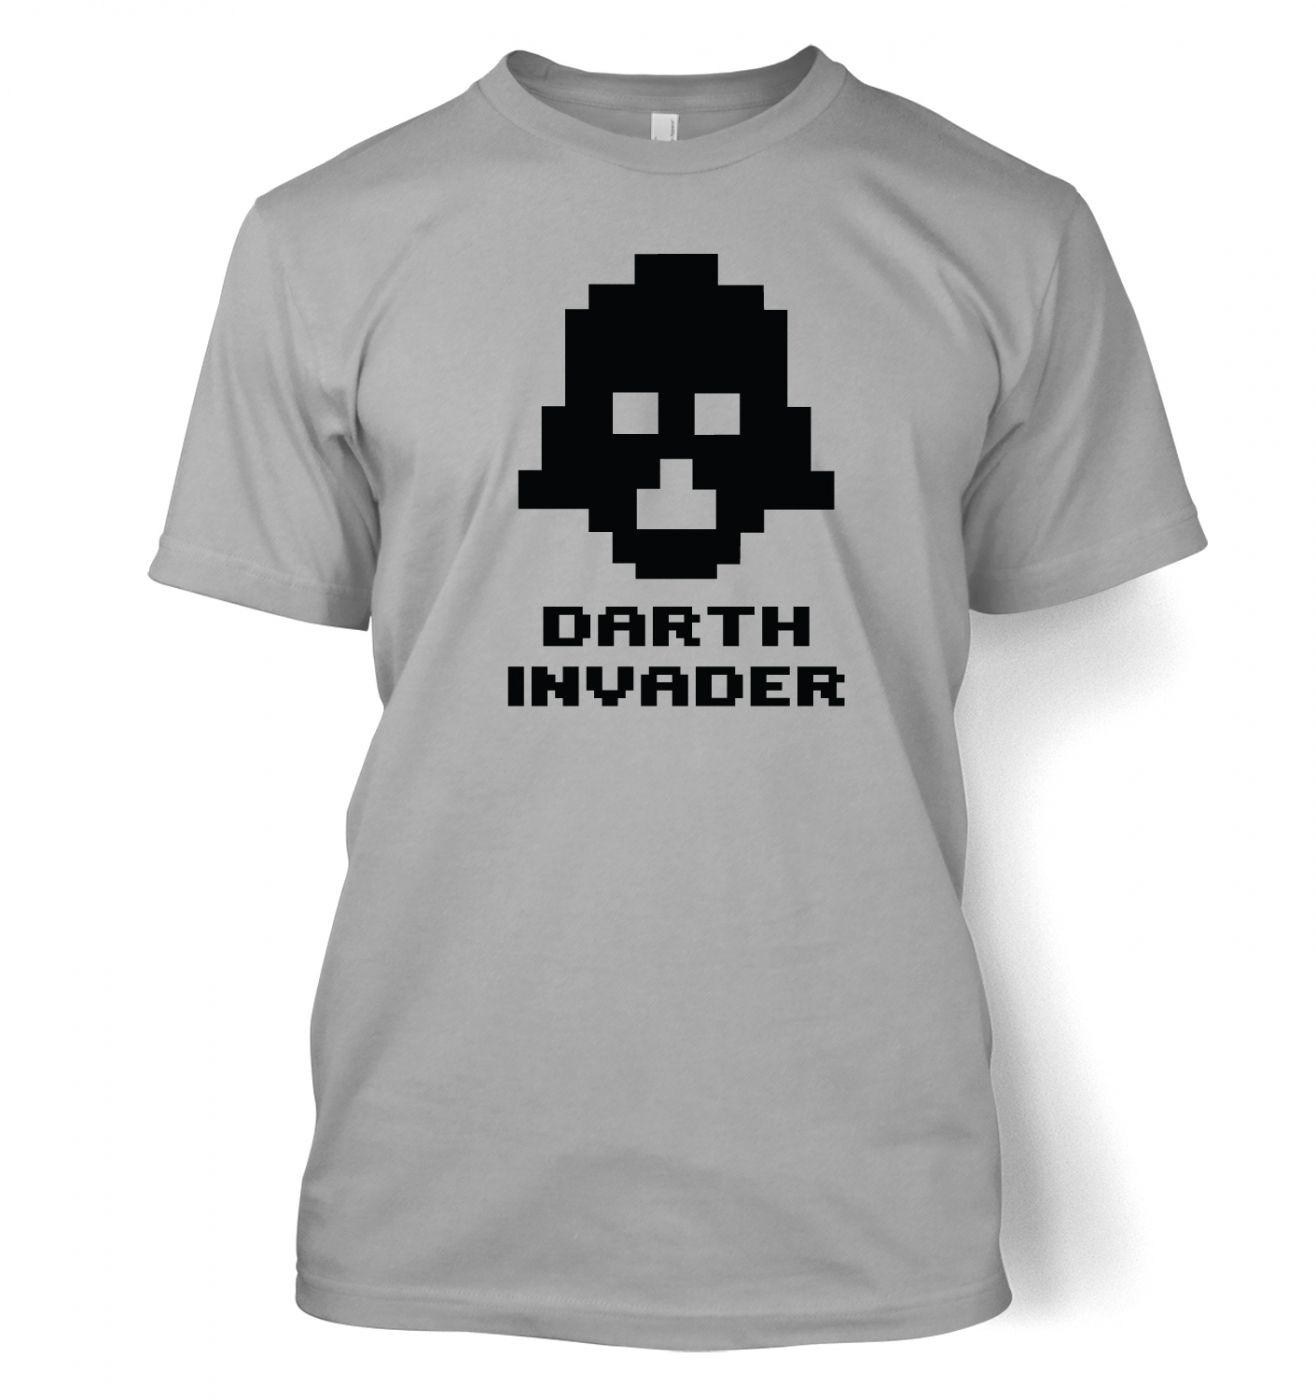 Darth Invader men's t-shirt